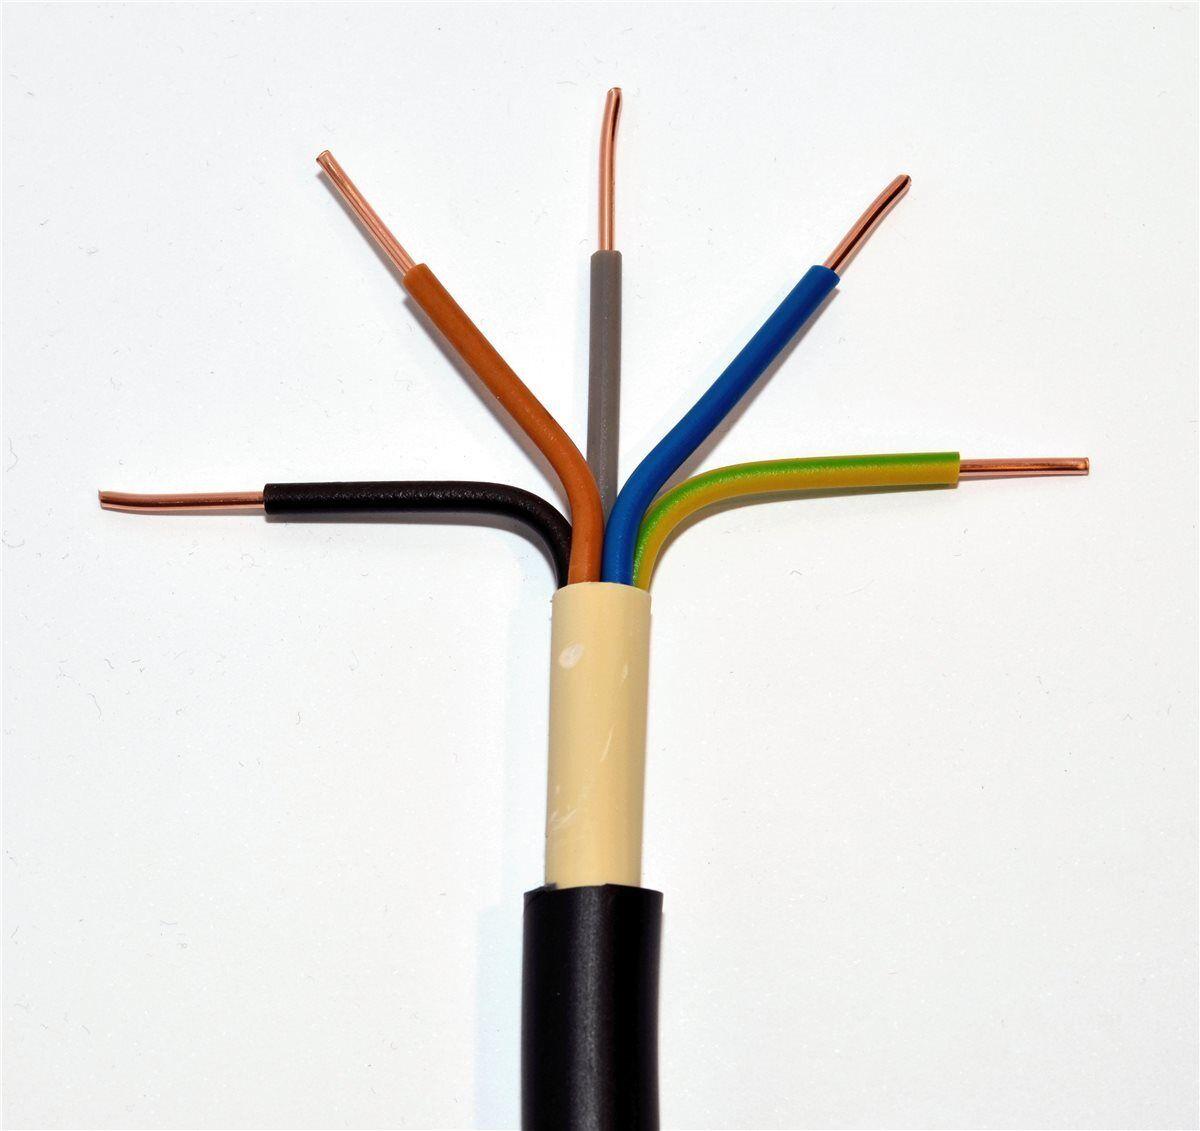 25m Erdkabel NYY-J 5x4 mm² schwarz Ring 5x4qmm Starkstromkabel Drehstromkabel